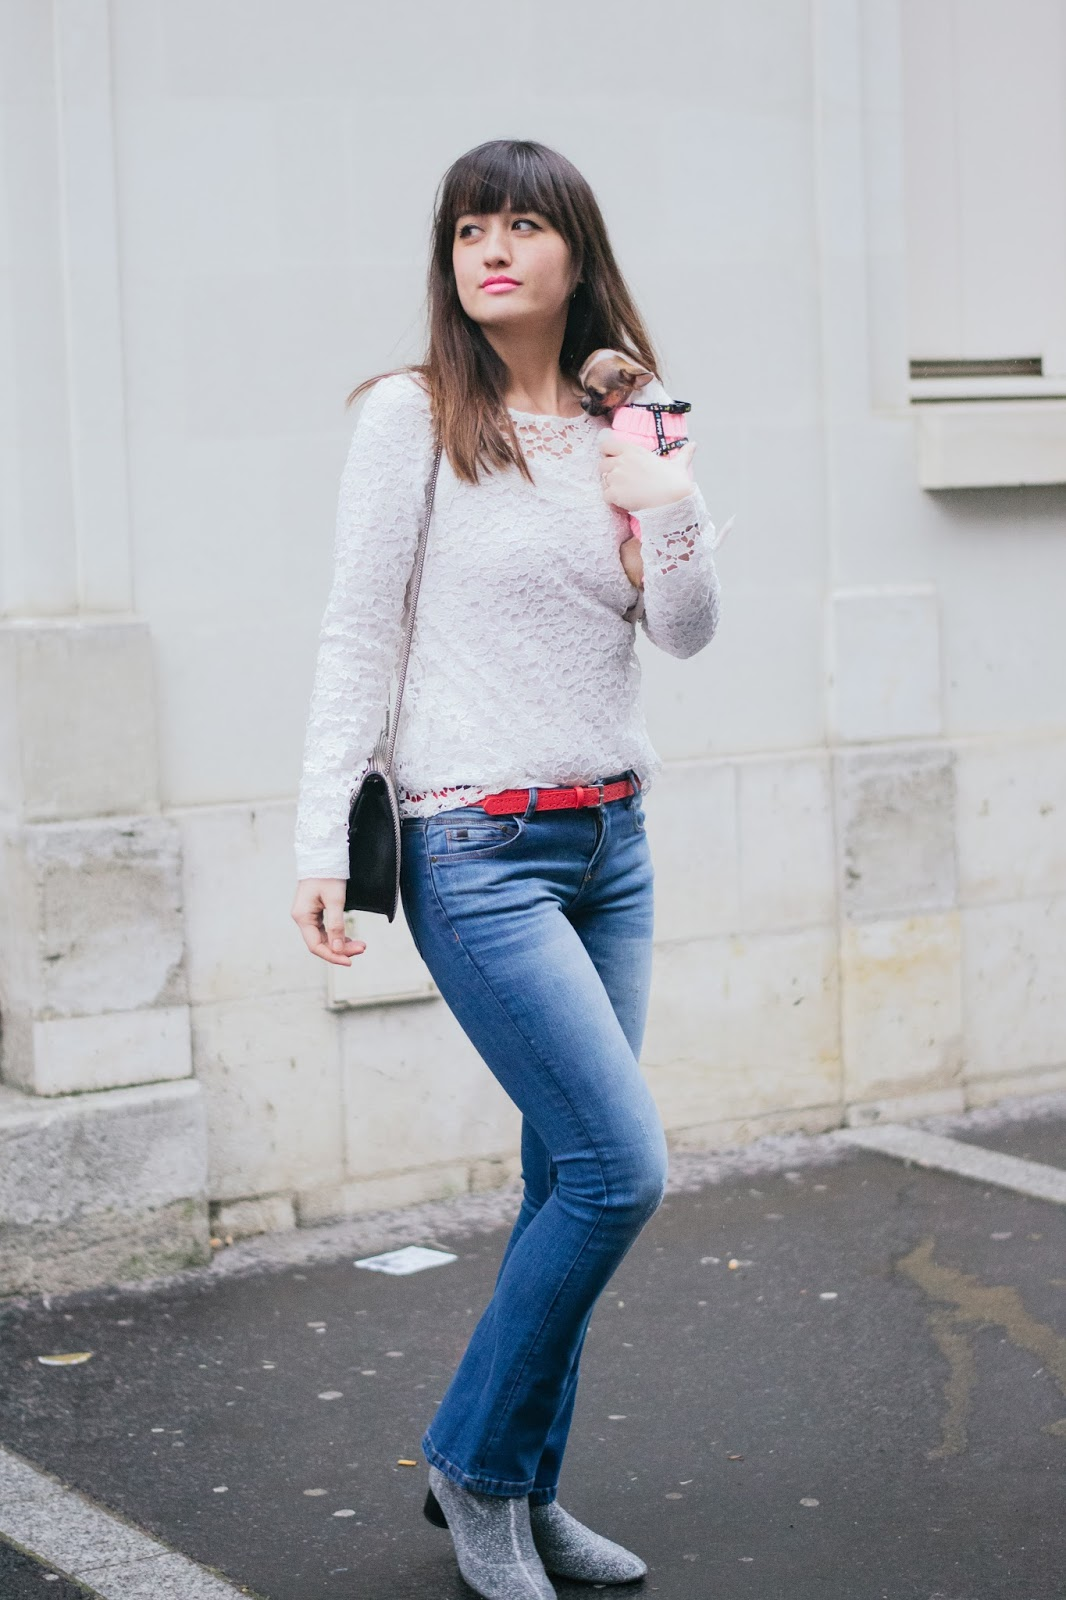 Parisian fashion blogger, style, look, mode, paris, promod, jeans, flared jeans